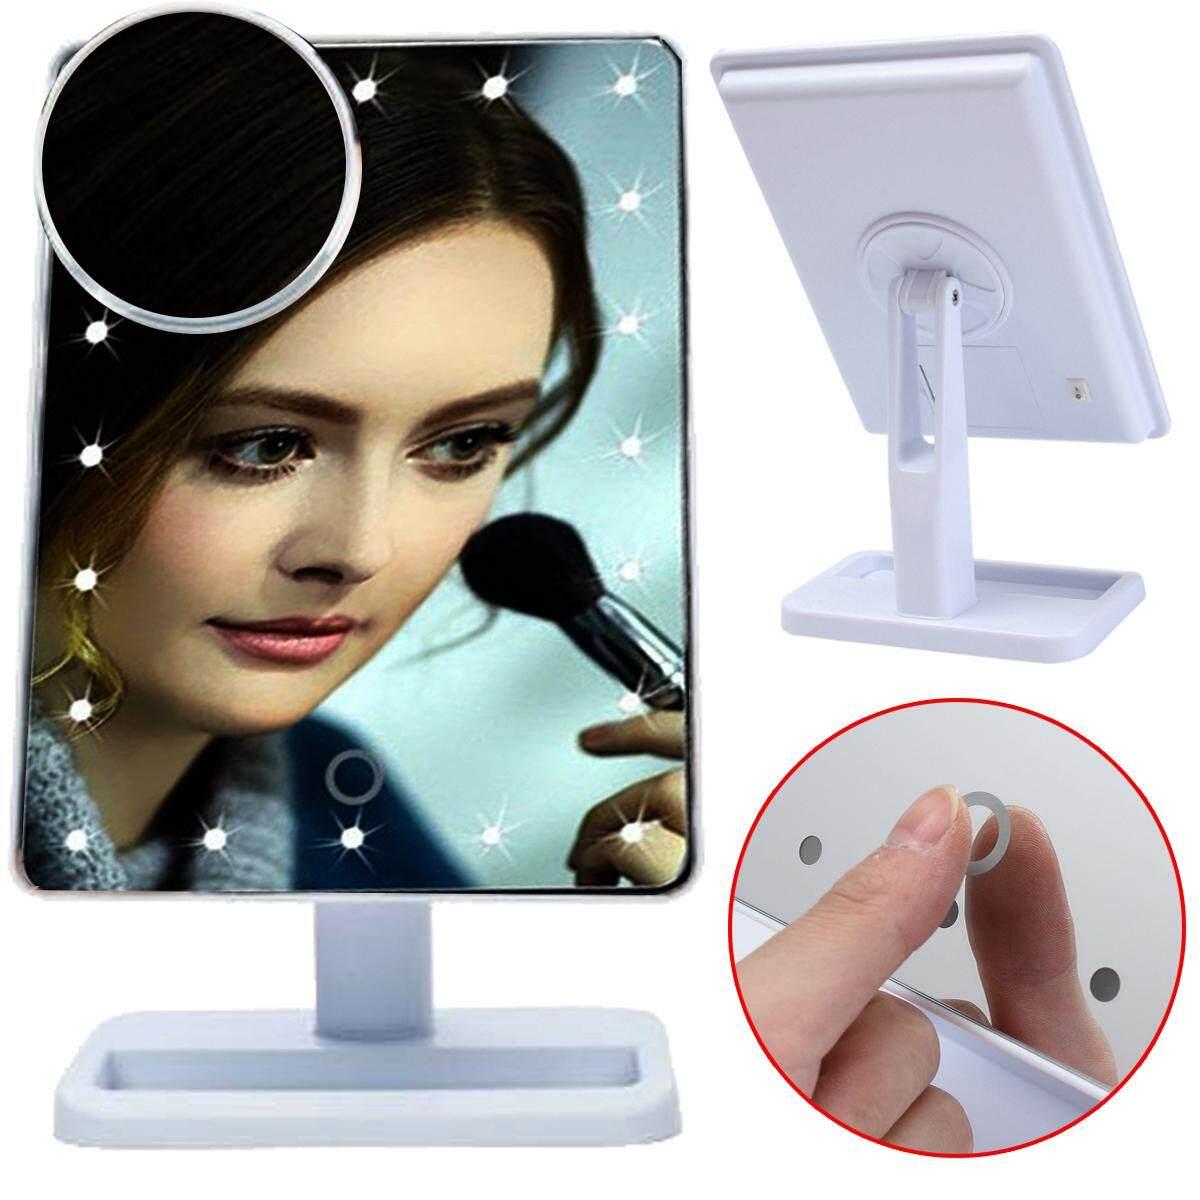 20 LEDs Touch Light Illuminated Make Up Cosmetic Bathroom Shaving Vanity Mirror White - intl